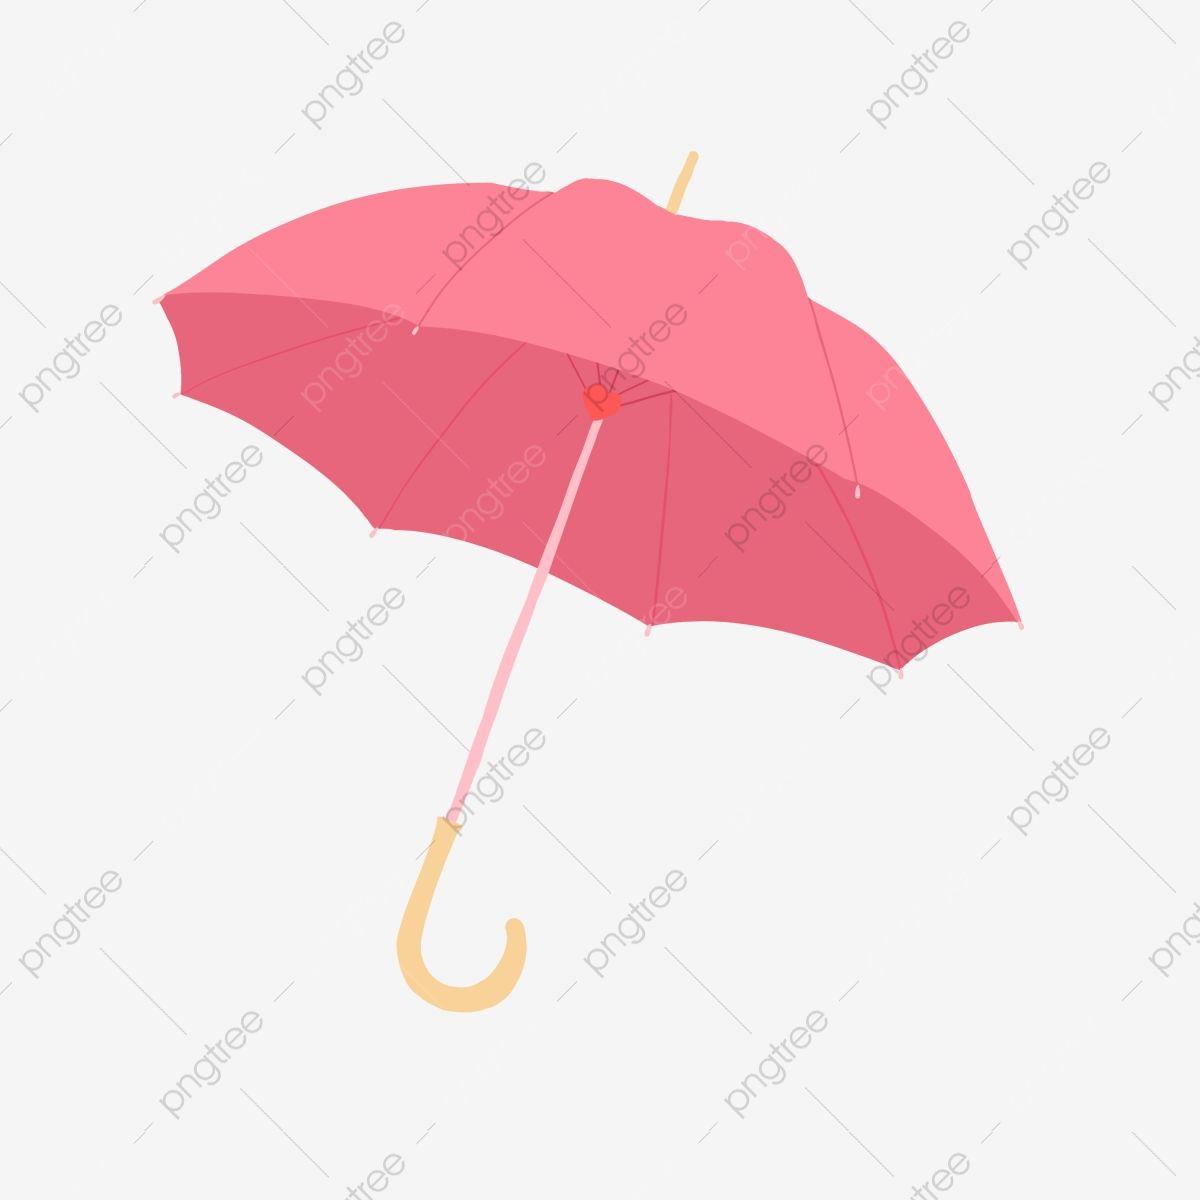 Pink Umbrella Cute Umbrella Hand Drawn Umbrella Beautiful Umbrella, Beautiful Umbrella, Pink Umbrella, Cute Umbrella PNG Transparent Clipart Image and PSD File for Free Download